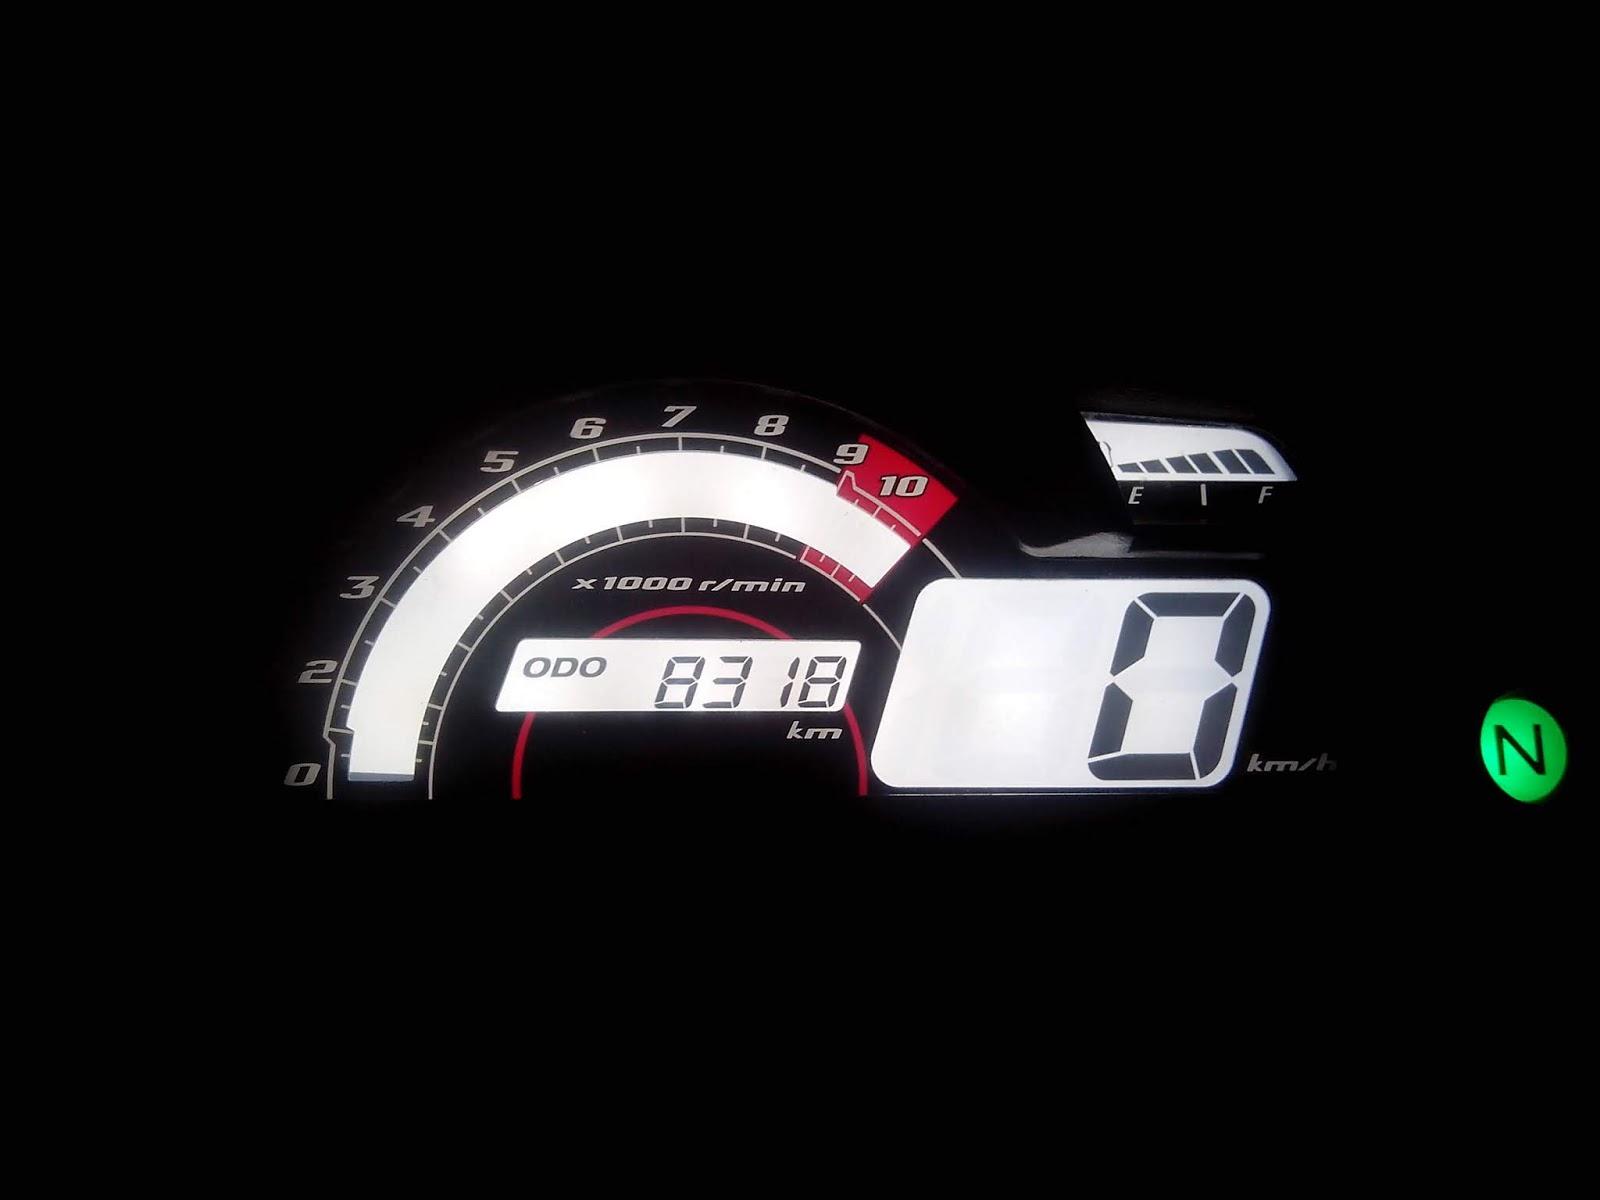 yamaha fz16 speedometer panel failure causes techy at daytechy at day, blogger at noon, and a hobbyist at night